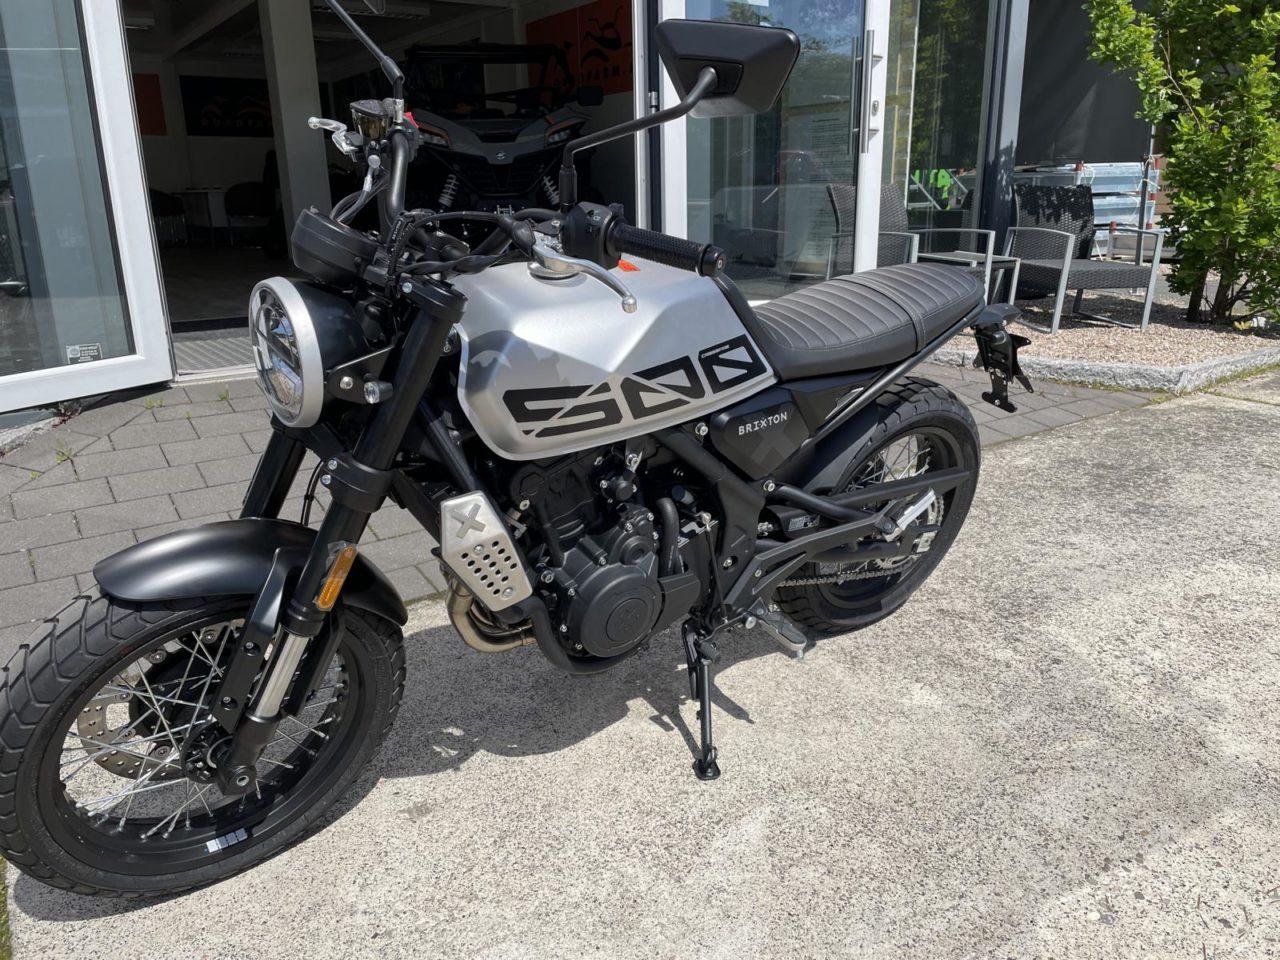 Motorrad Brixton Crossfire 500 X, Modell 2021, ABS u. Euro 5 silber